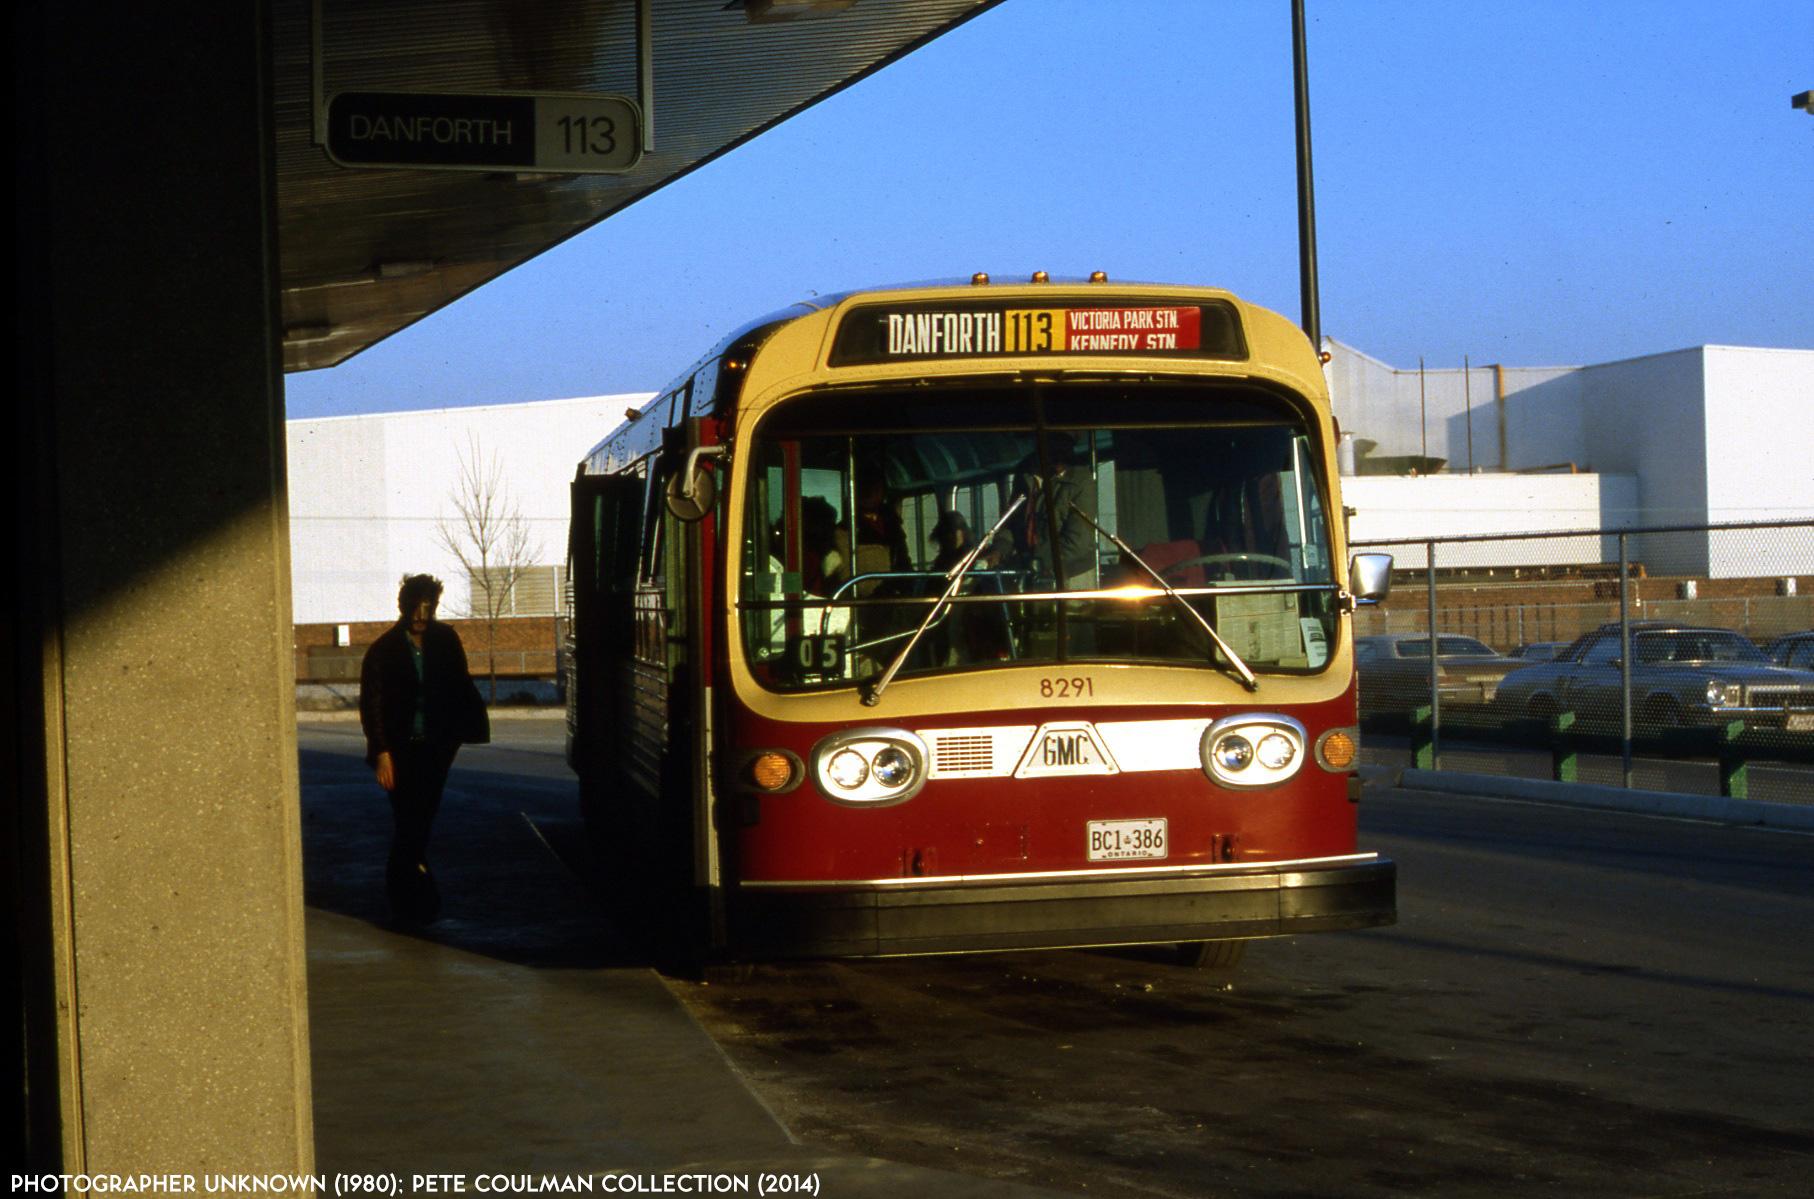 El juego de las imagenes-http://transit.toronto.on.ca/photos/images/ttc-8291-danforth-198011.jpg